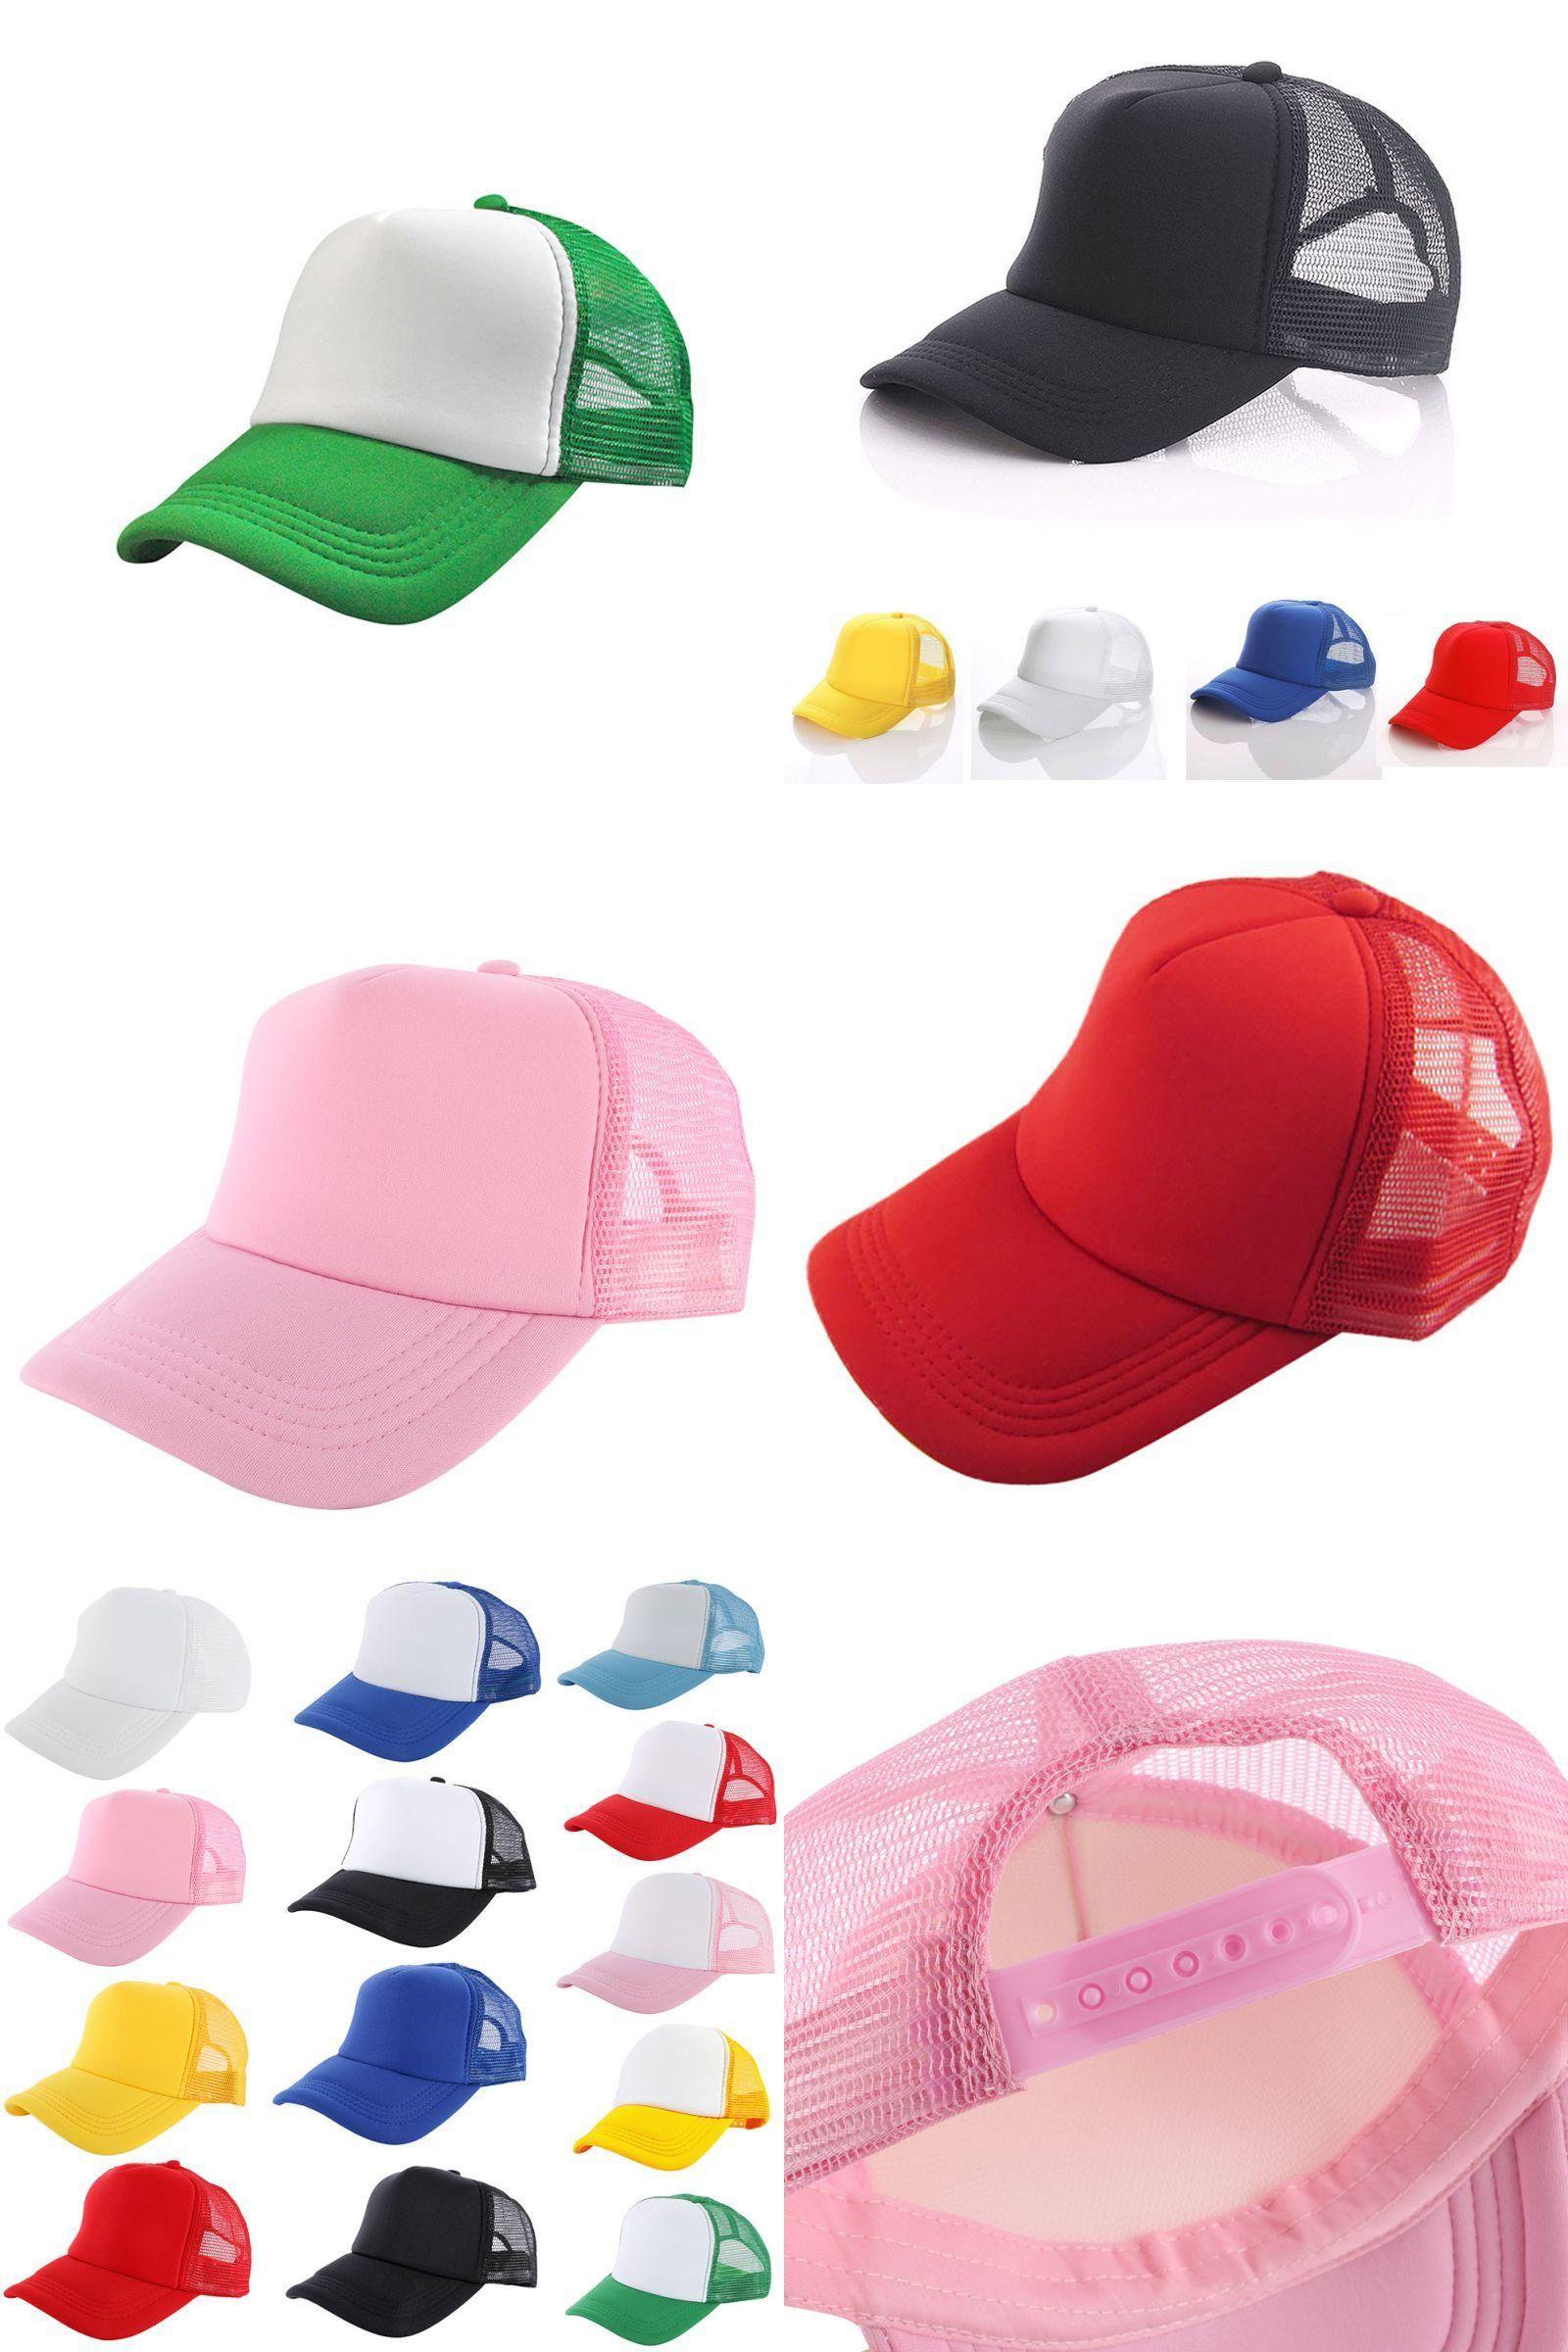 Visit to Buy  M34 Vogue Adjustable Baseball Cap Trucker Hat Blank Curved  Hat Mesh 5f28158a37de